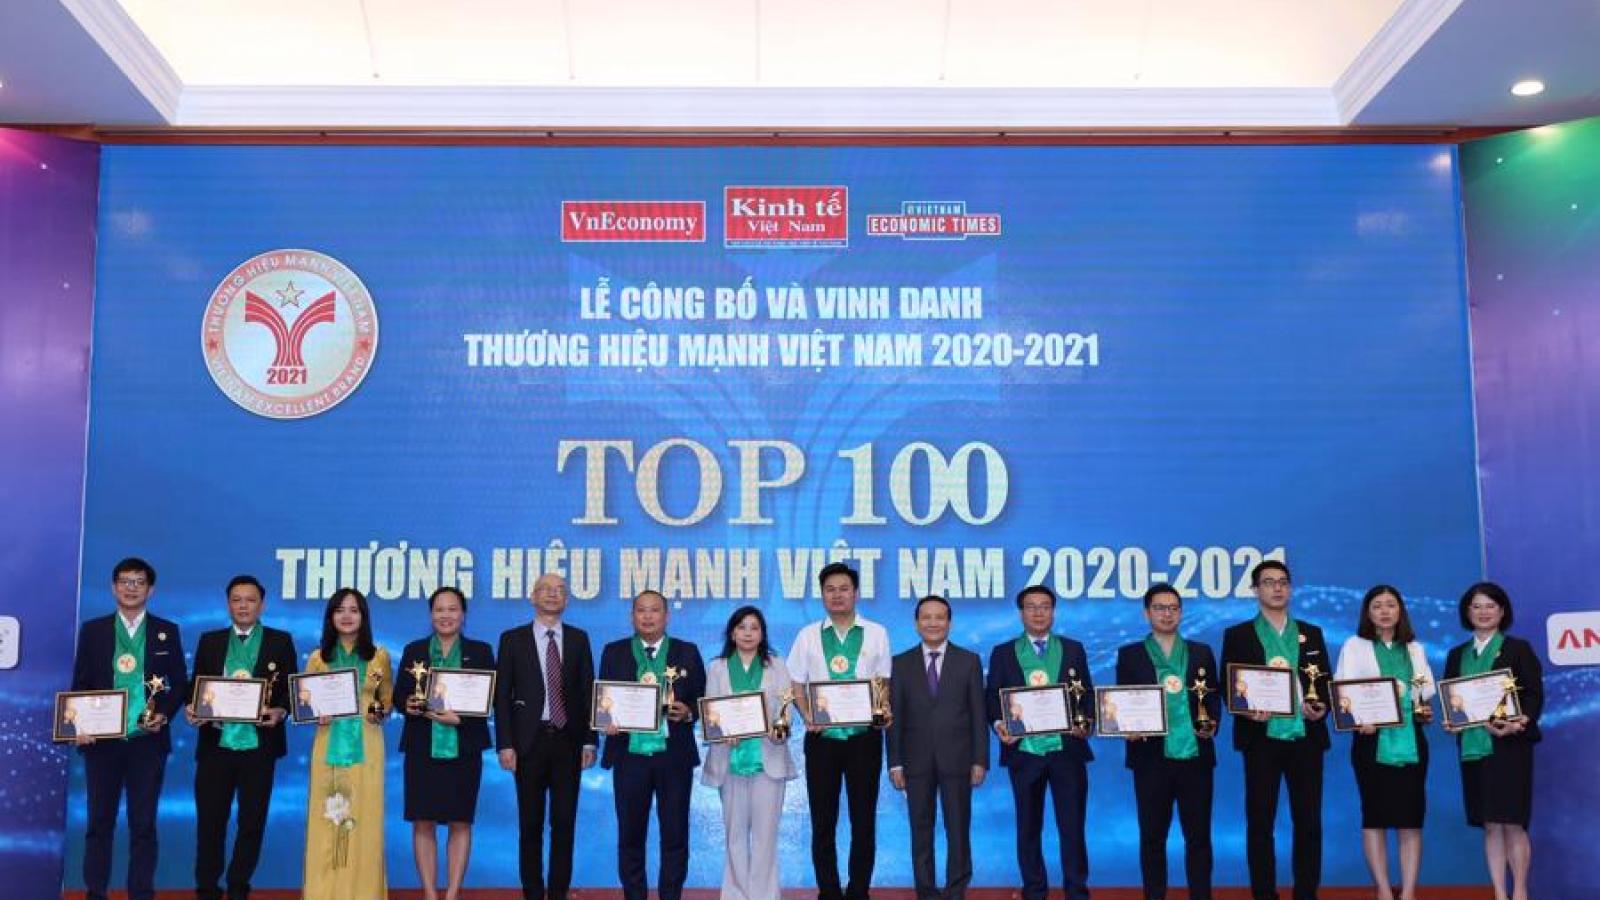 Top 109 Vietnamese strong brands 2021 announced